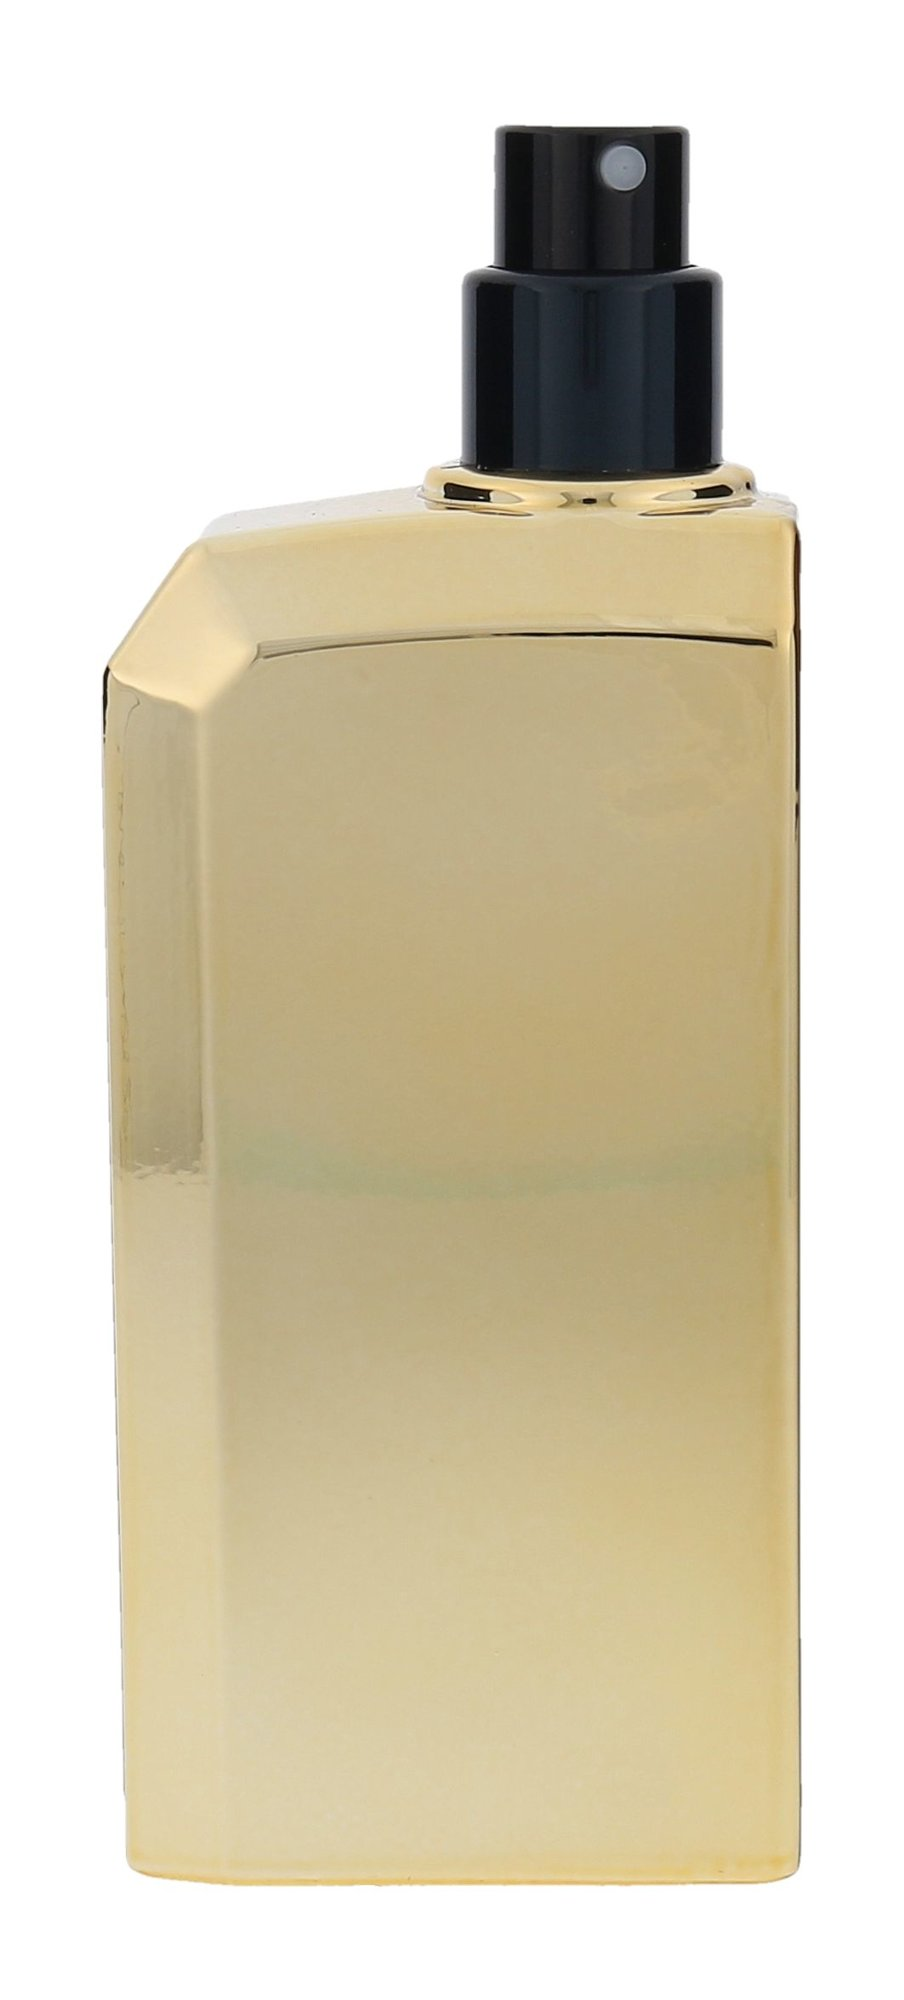 Histoires de Parfums Edition Rare Vidi EDP 60ml